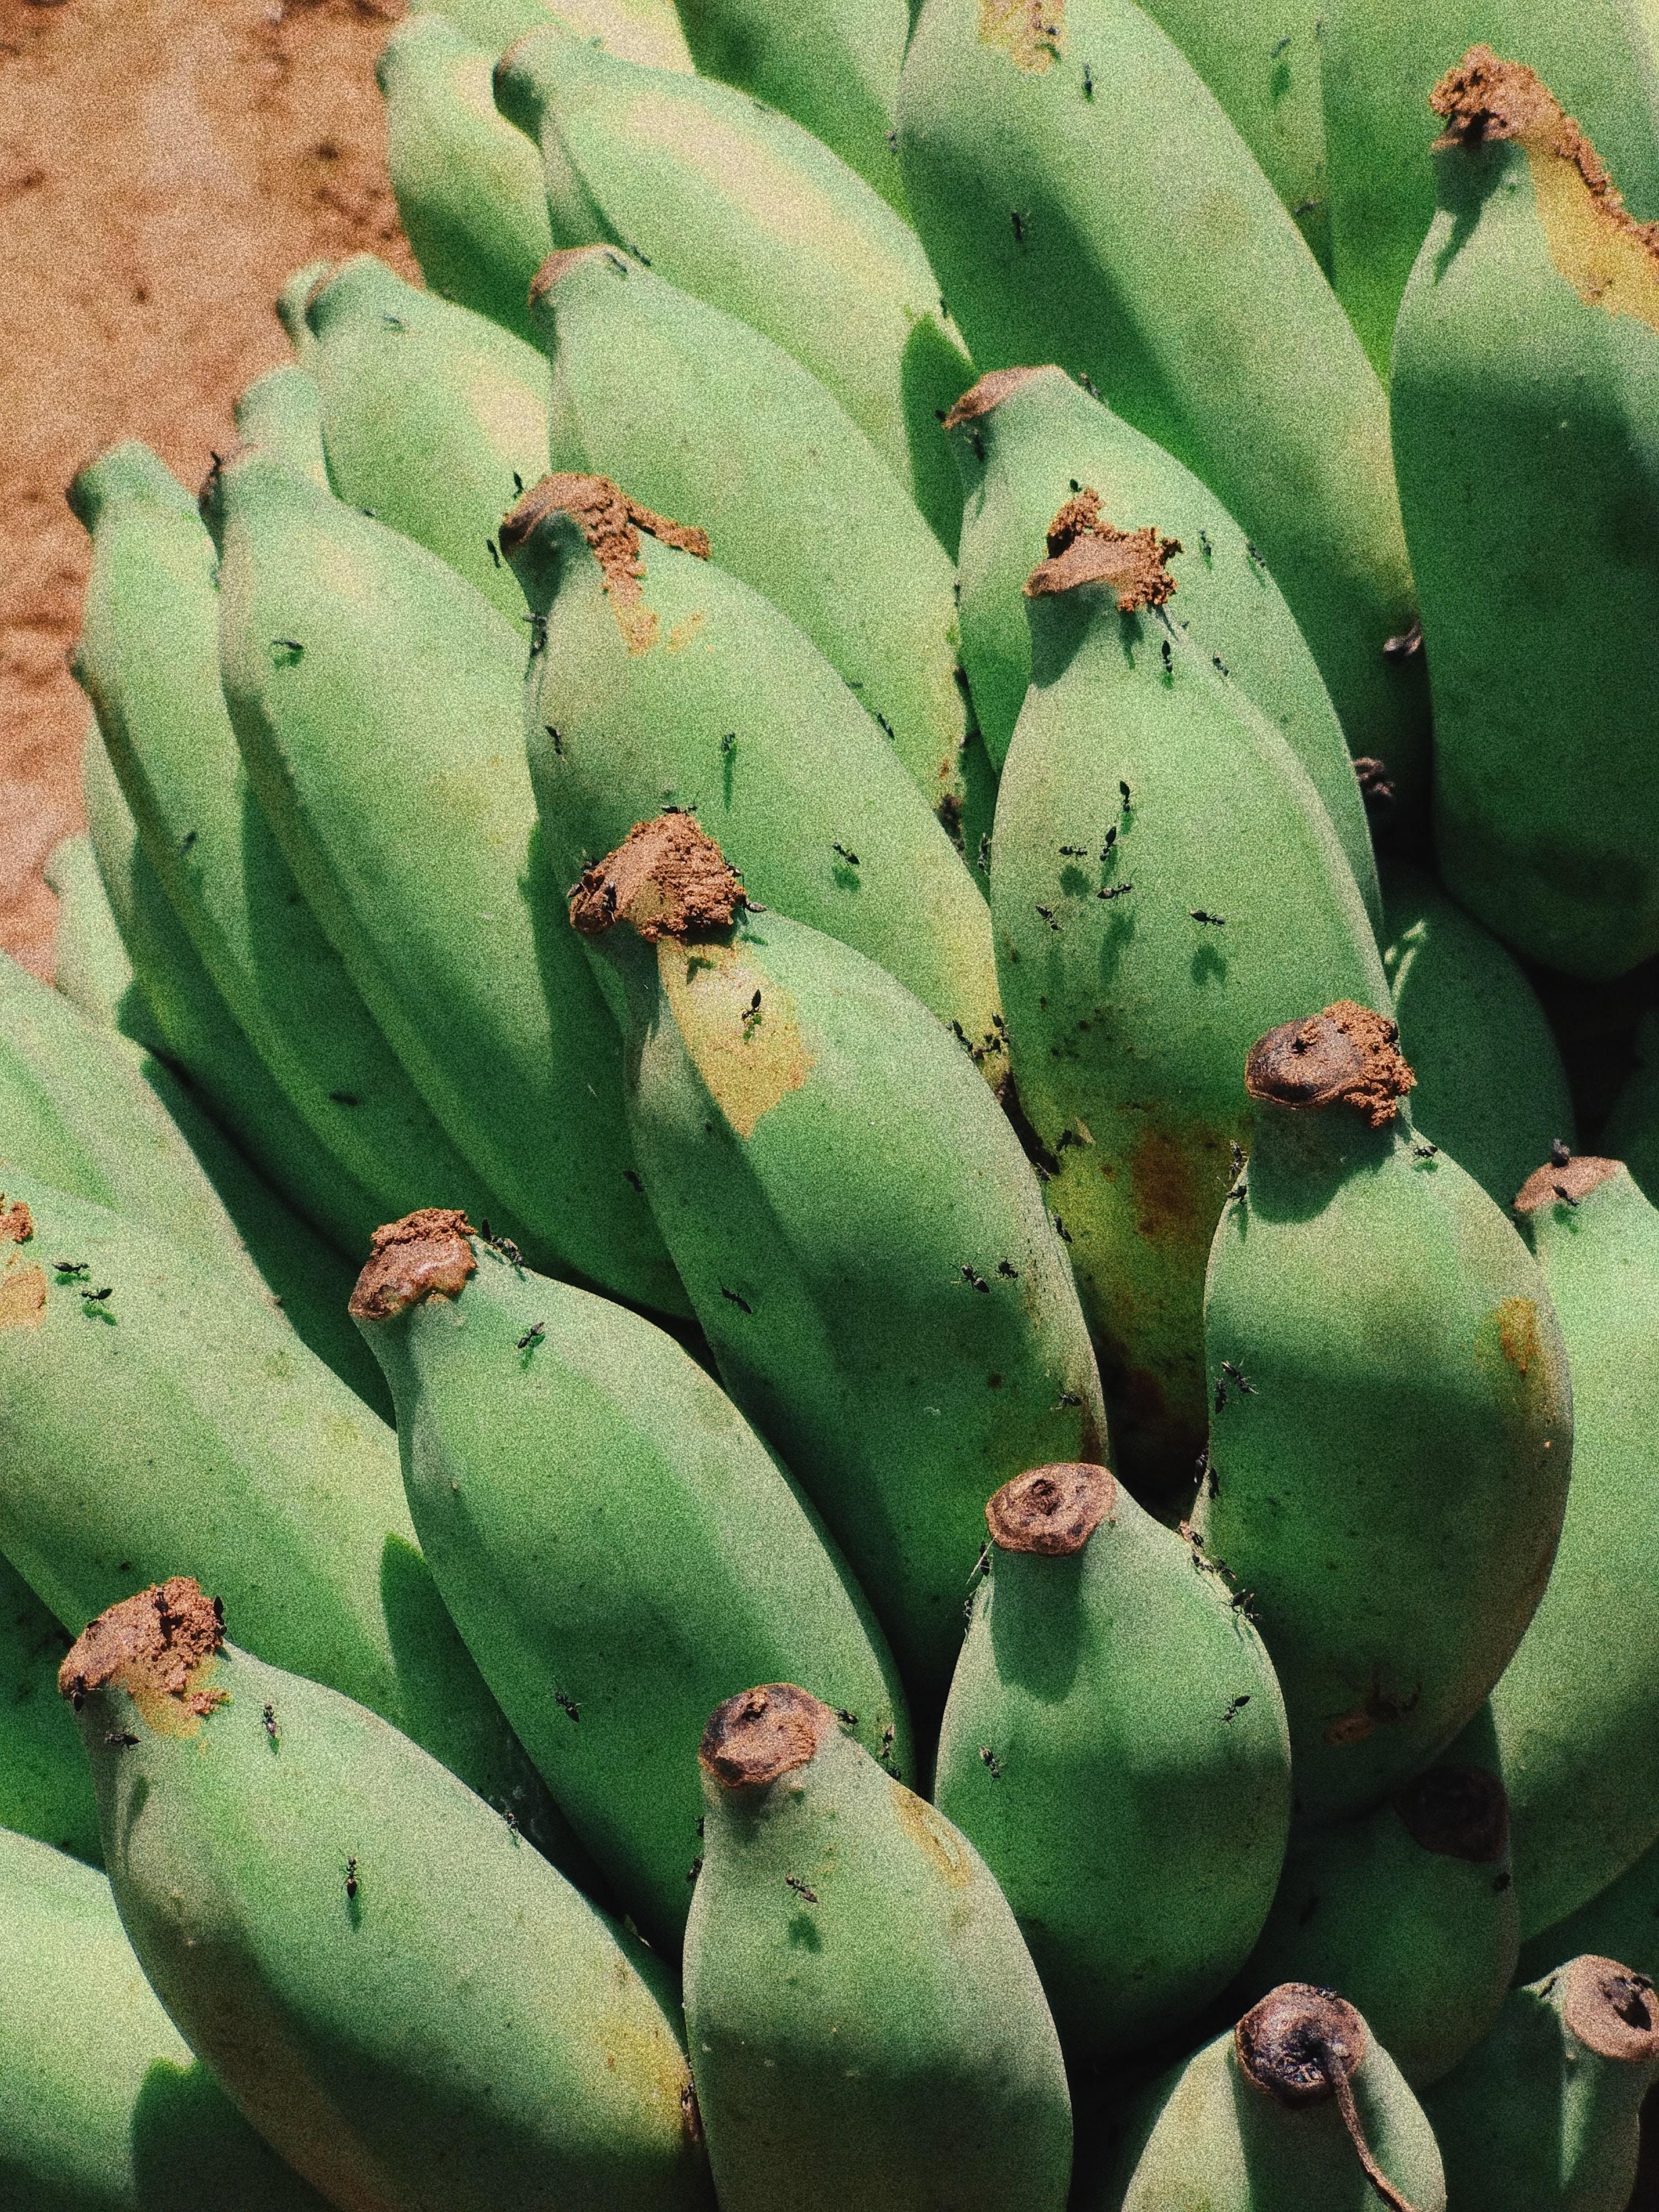 hand of green banana